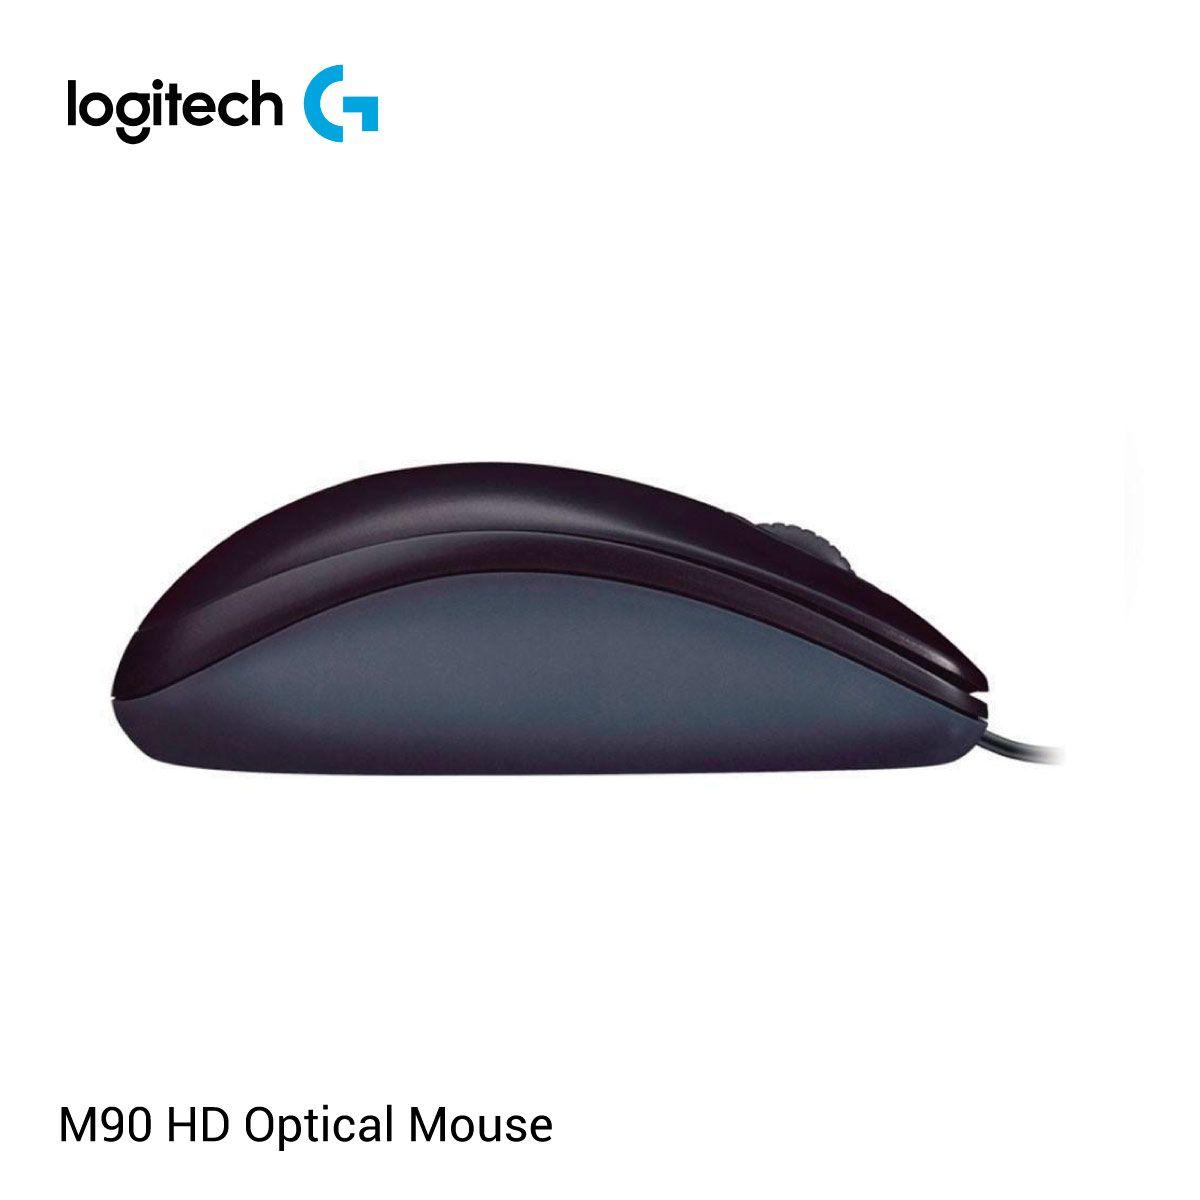 M90 HD Optical Mouse Logitech